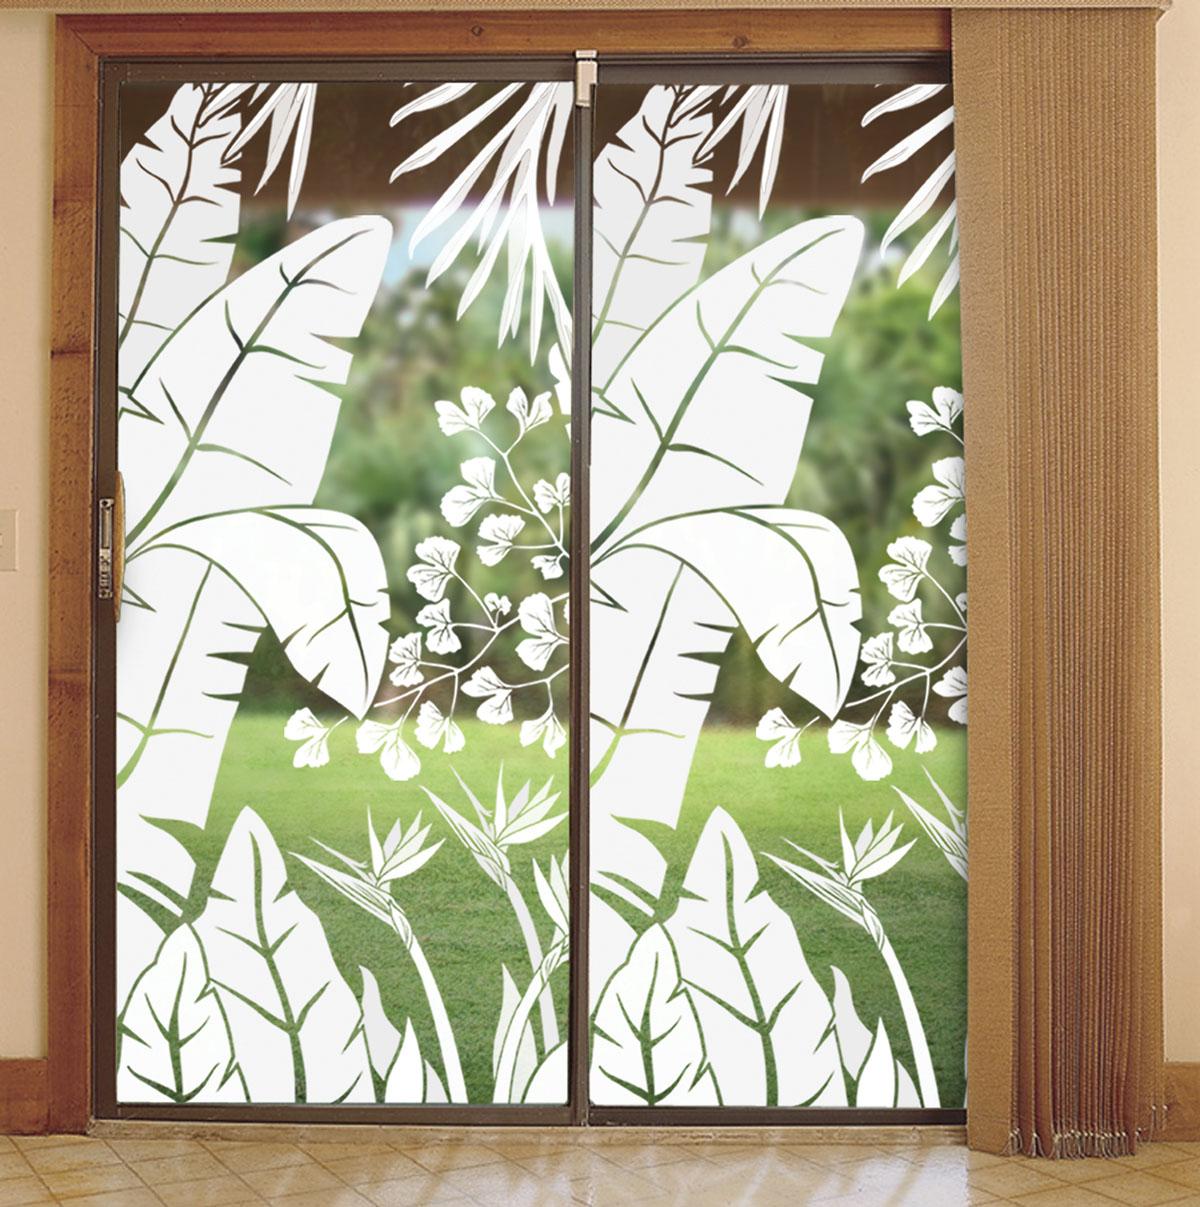 http://1.bp.blogspot.com/-CB6Y8yRQLMI/UArVP6dcXnI/AAAAAAAABOE/EsnyFTaRgn8/s1600/Sliding-Glass-Doors-Wallparer-For-Windows-1.jpg